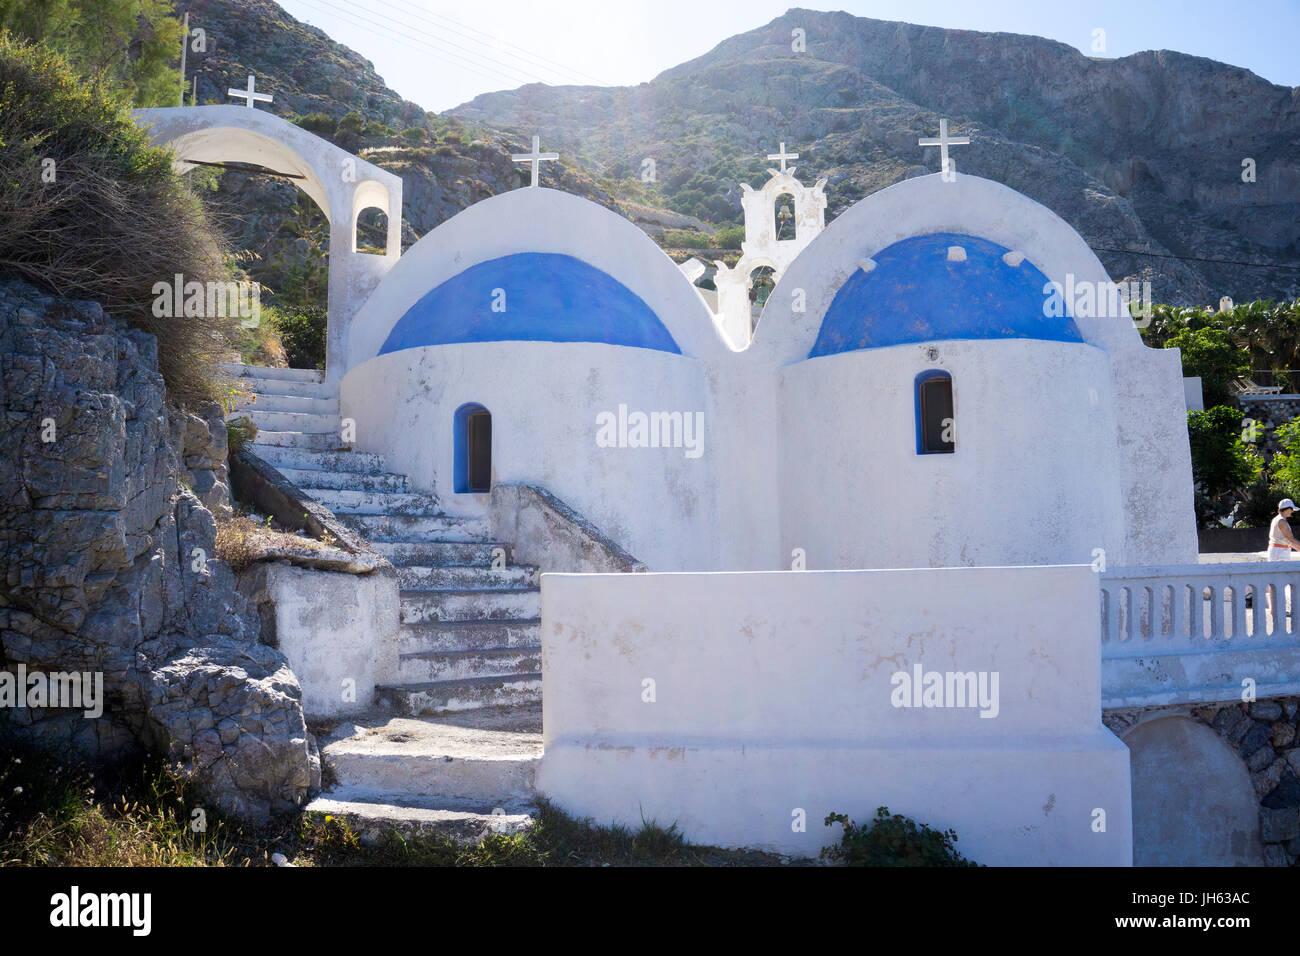 Die kleine Kapelle Agios Nikolaos am Ende vom Kamari Beach, Santorin, Kykladen, Aegaeis, Griechenland, Mittelmeer, - Stock Image